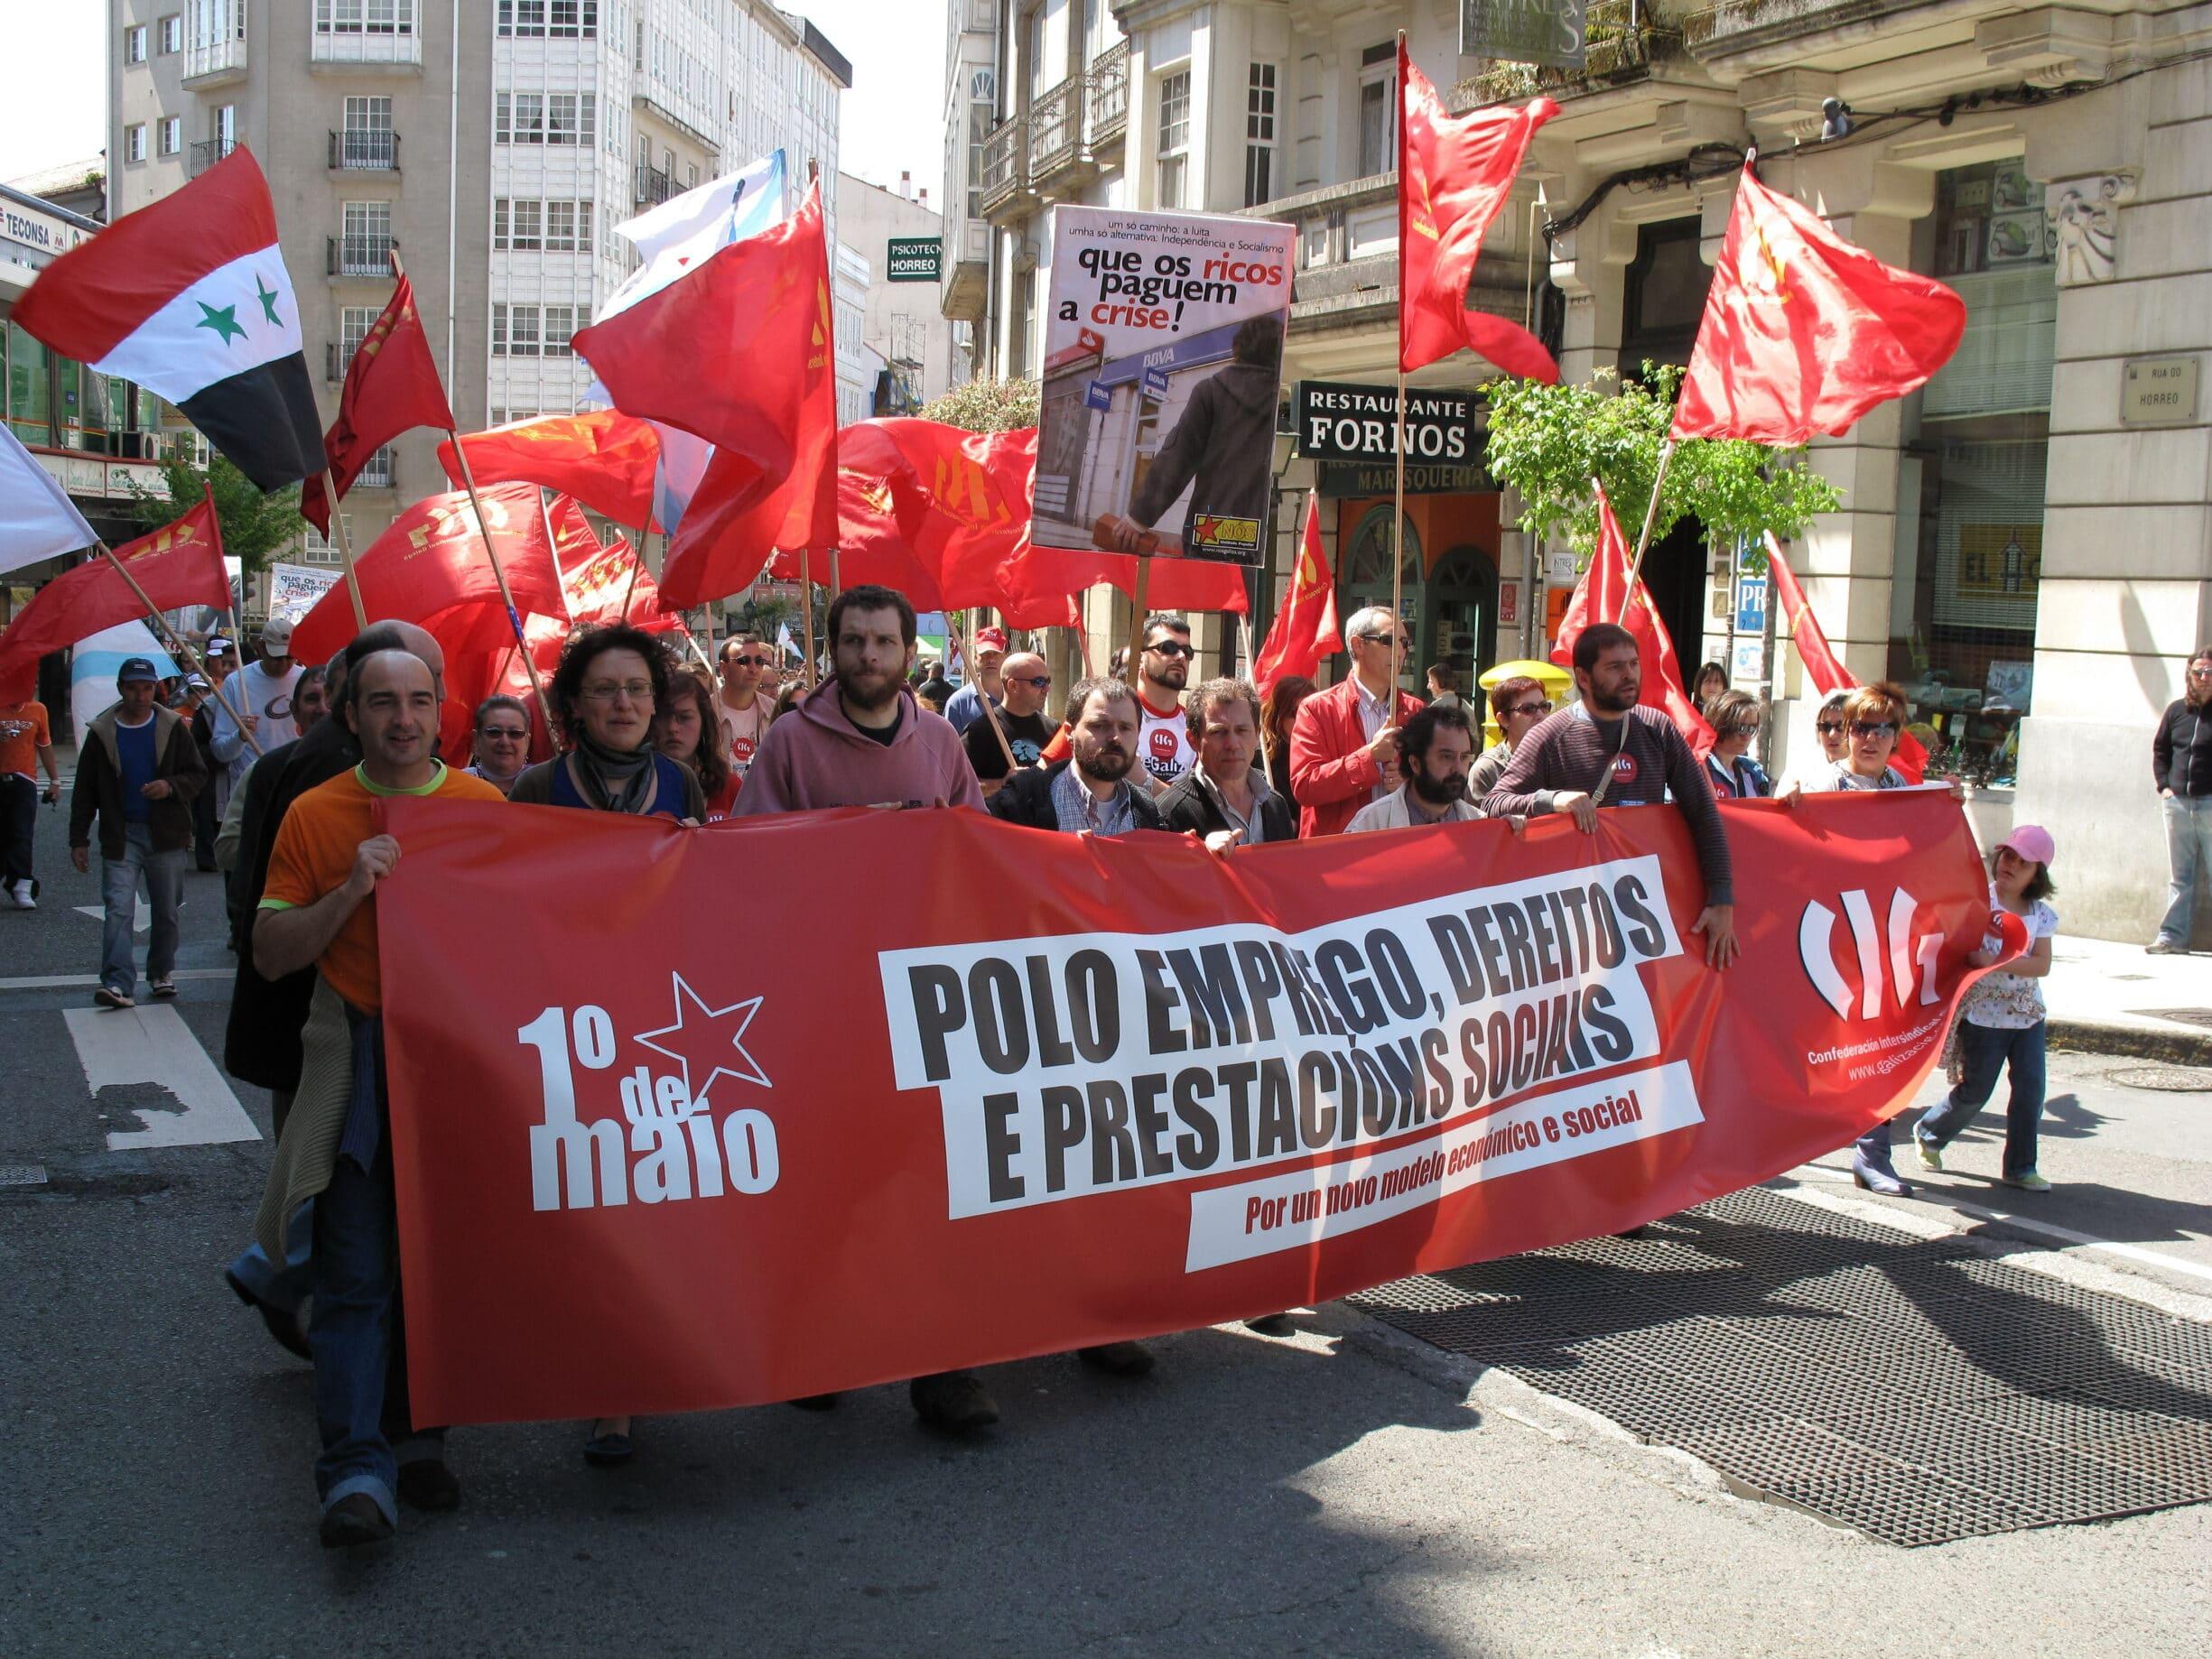 International 1. maj demonstration i Santiago de Compostela, Spanien 2009. Photo: Ciga. Public Domain.